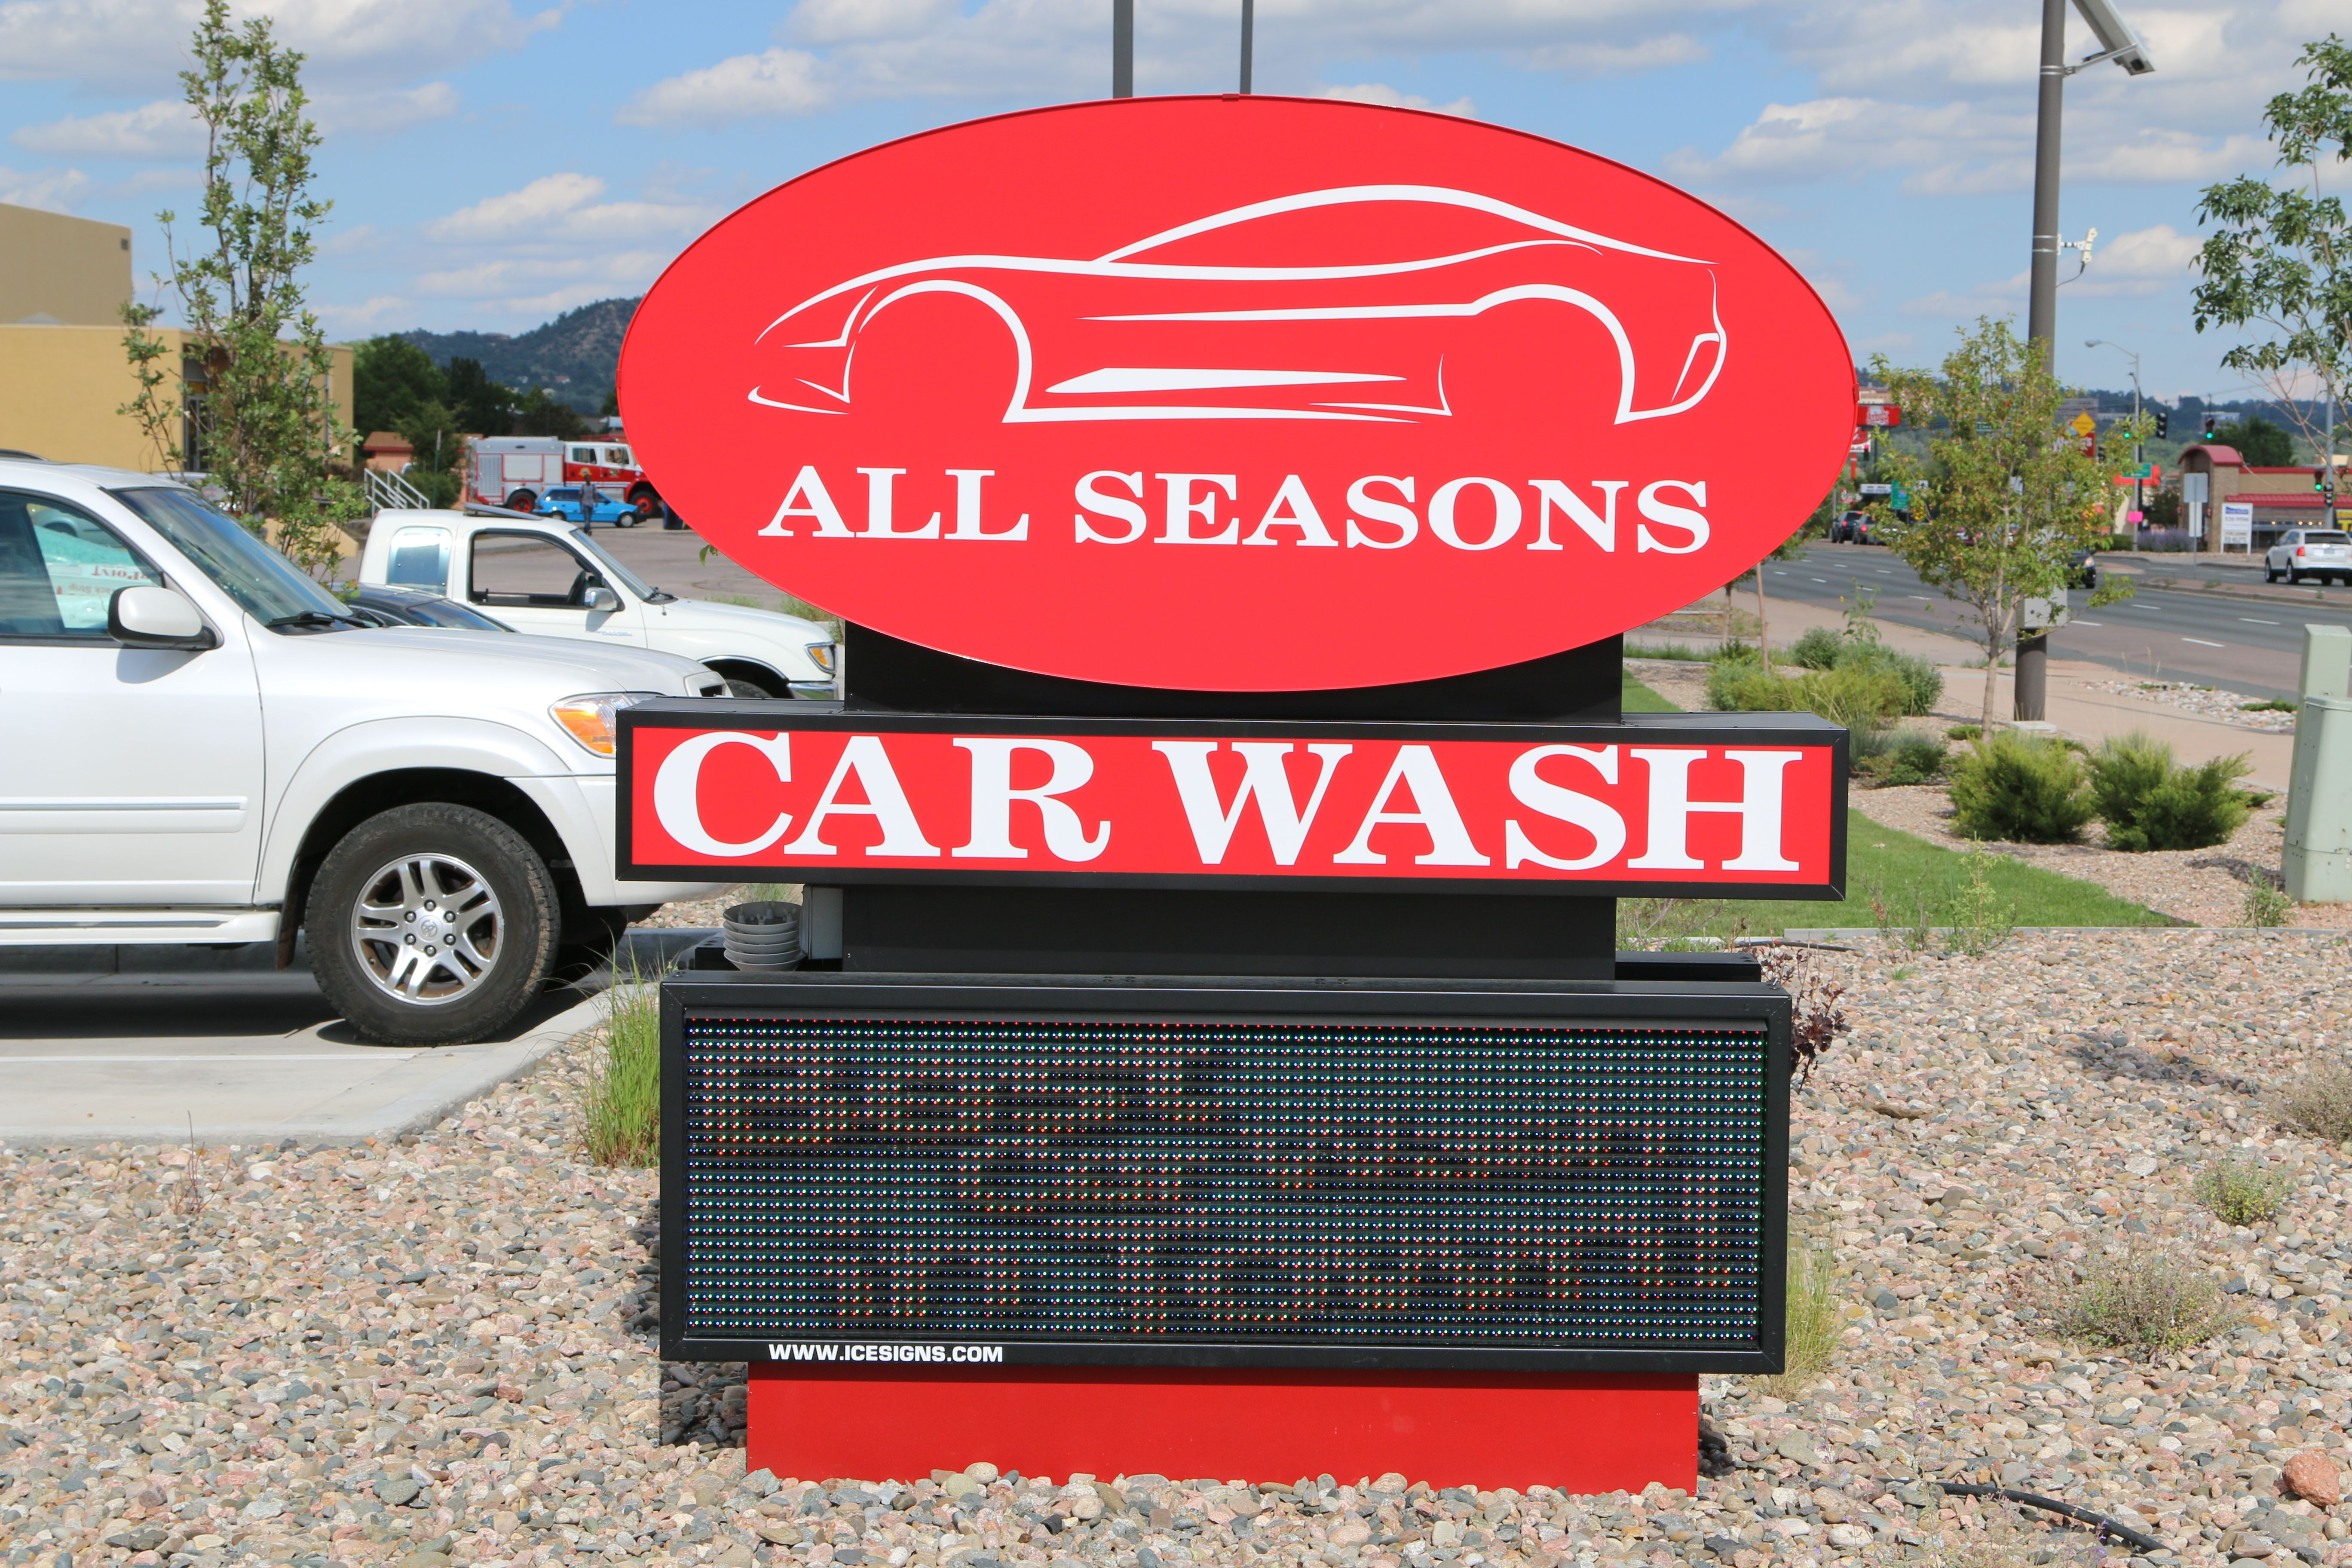 Led Sign With Images Car Wash Wash Seasons